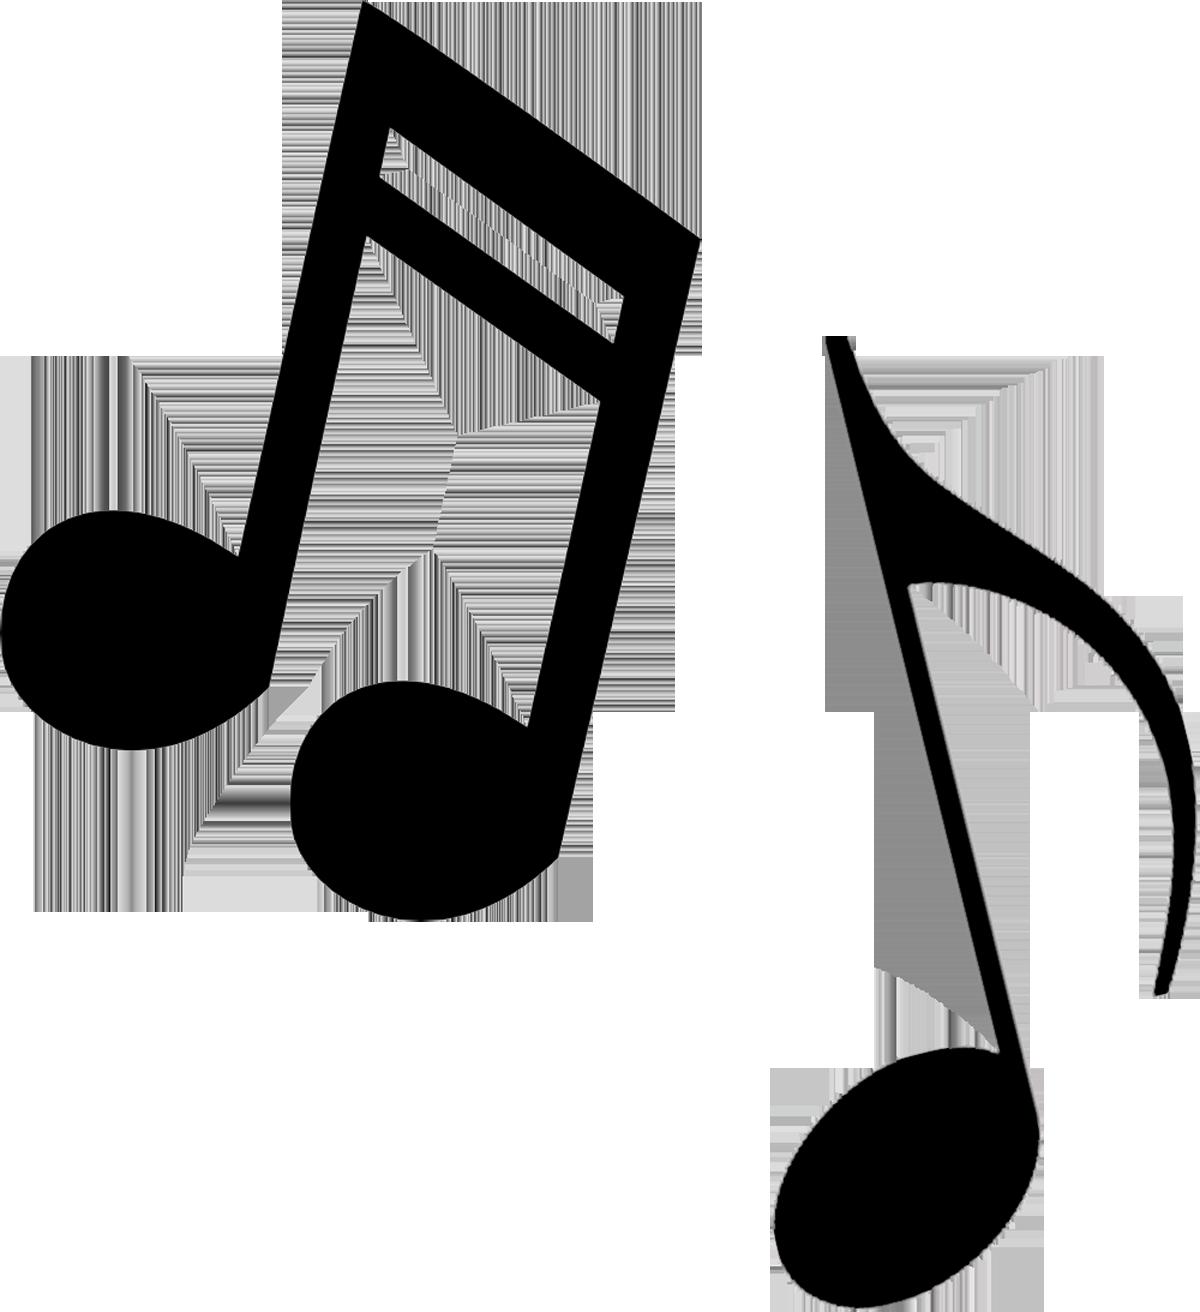 Rock Music Clipart Rock Star Guitar Clip-Rock Music Clipart Rock Star Guitar Clip Art Yikq5xnie Png-13